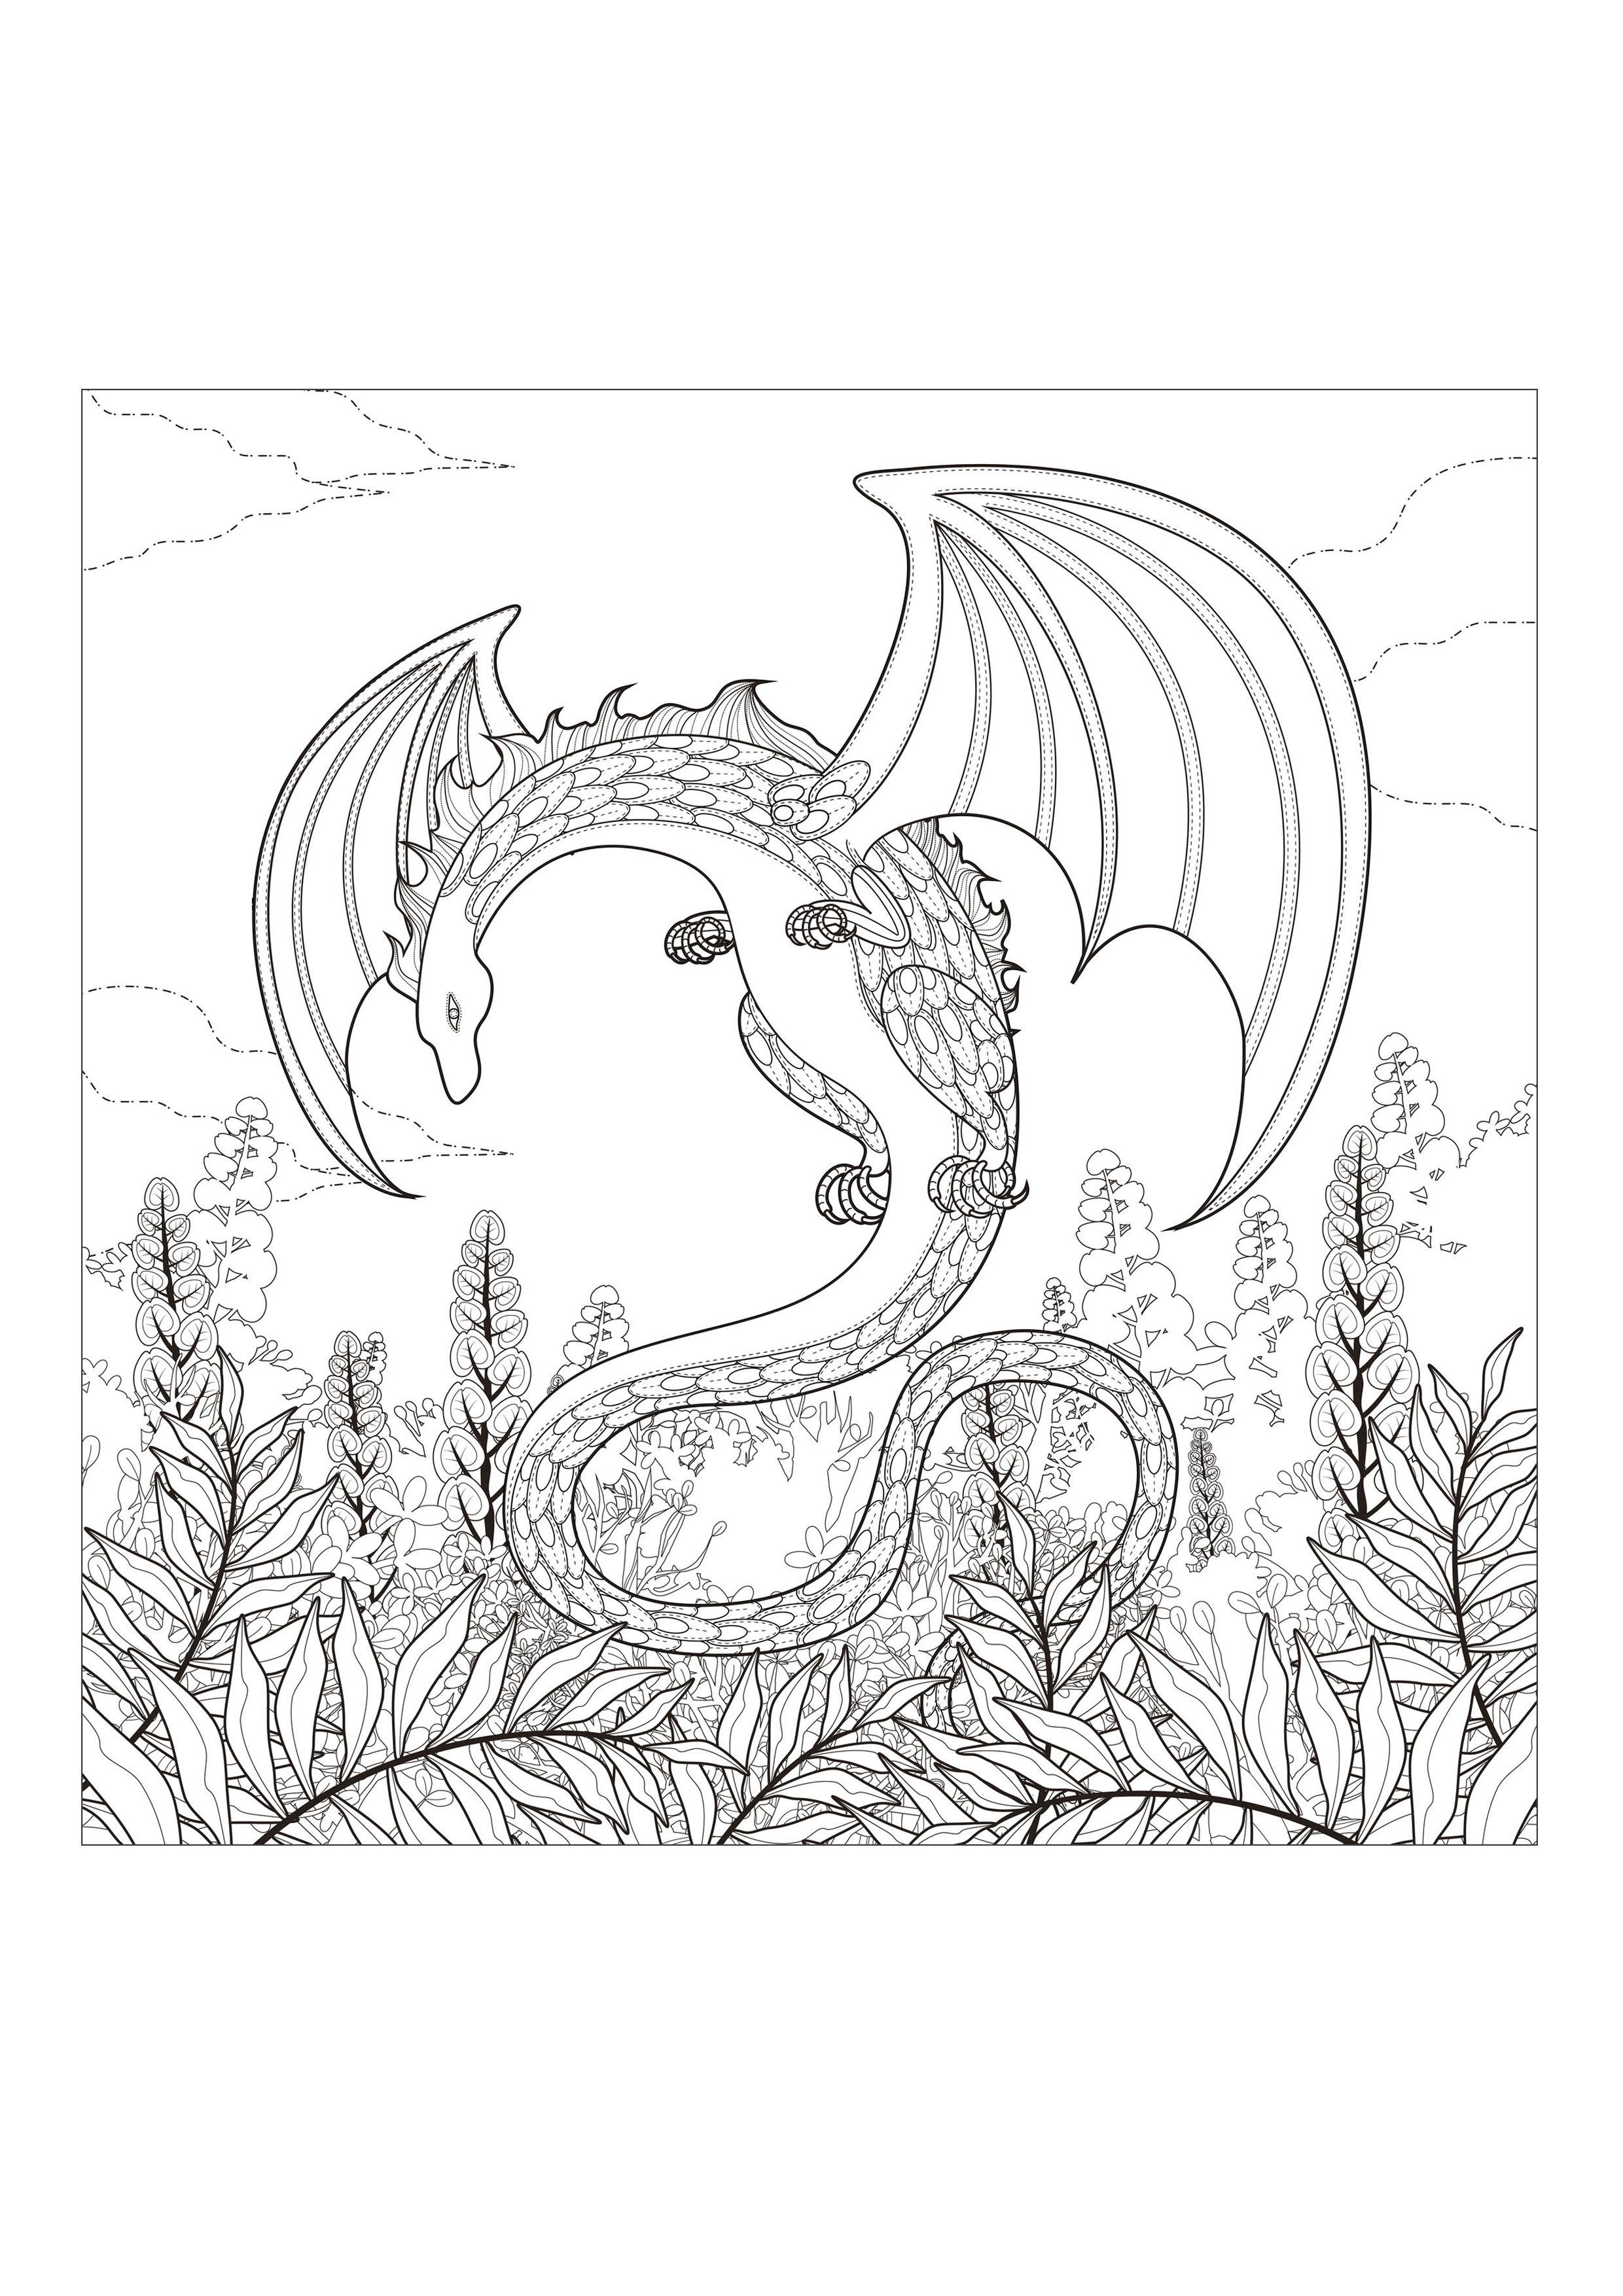 Monster Dragon Myths Amp Legends Coloring Pages For